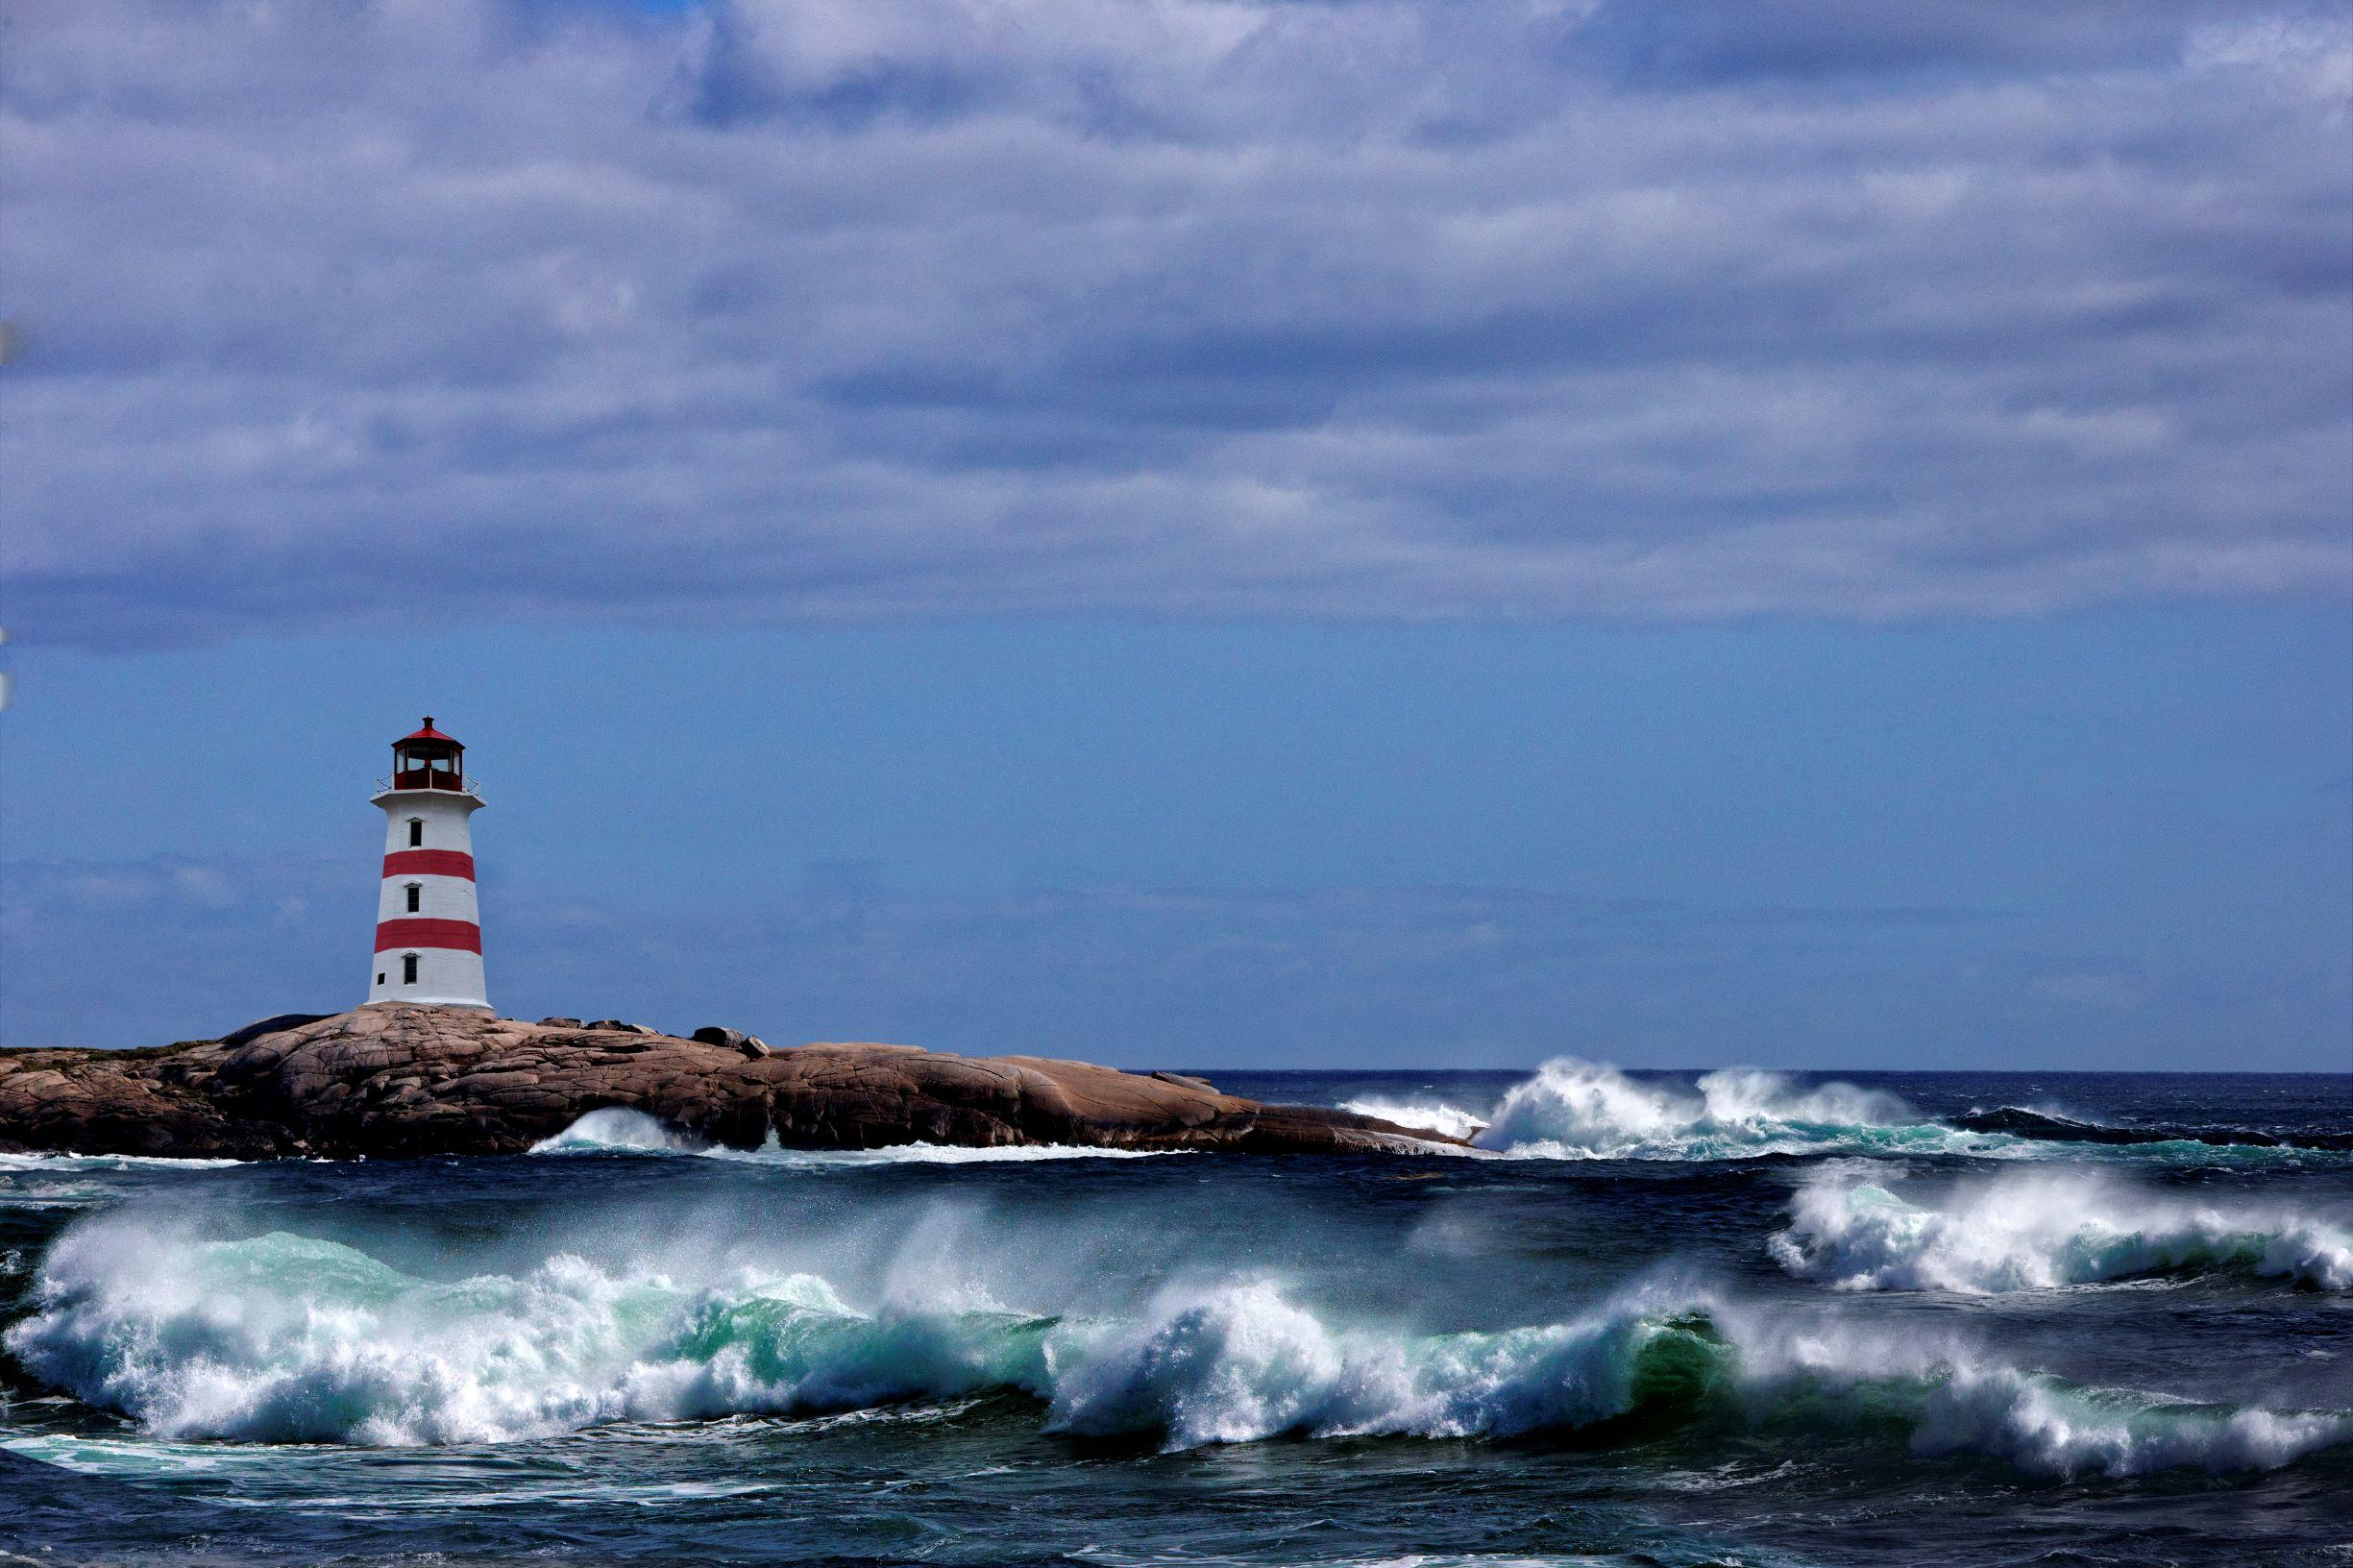 Seeking shelter in stormy seas Thumbnail